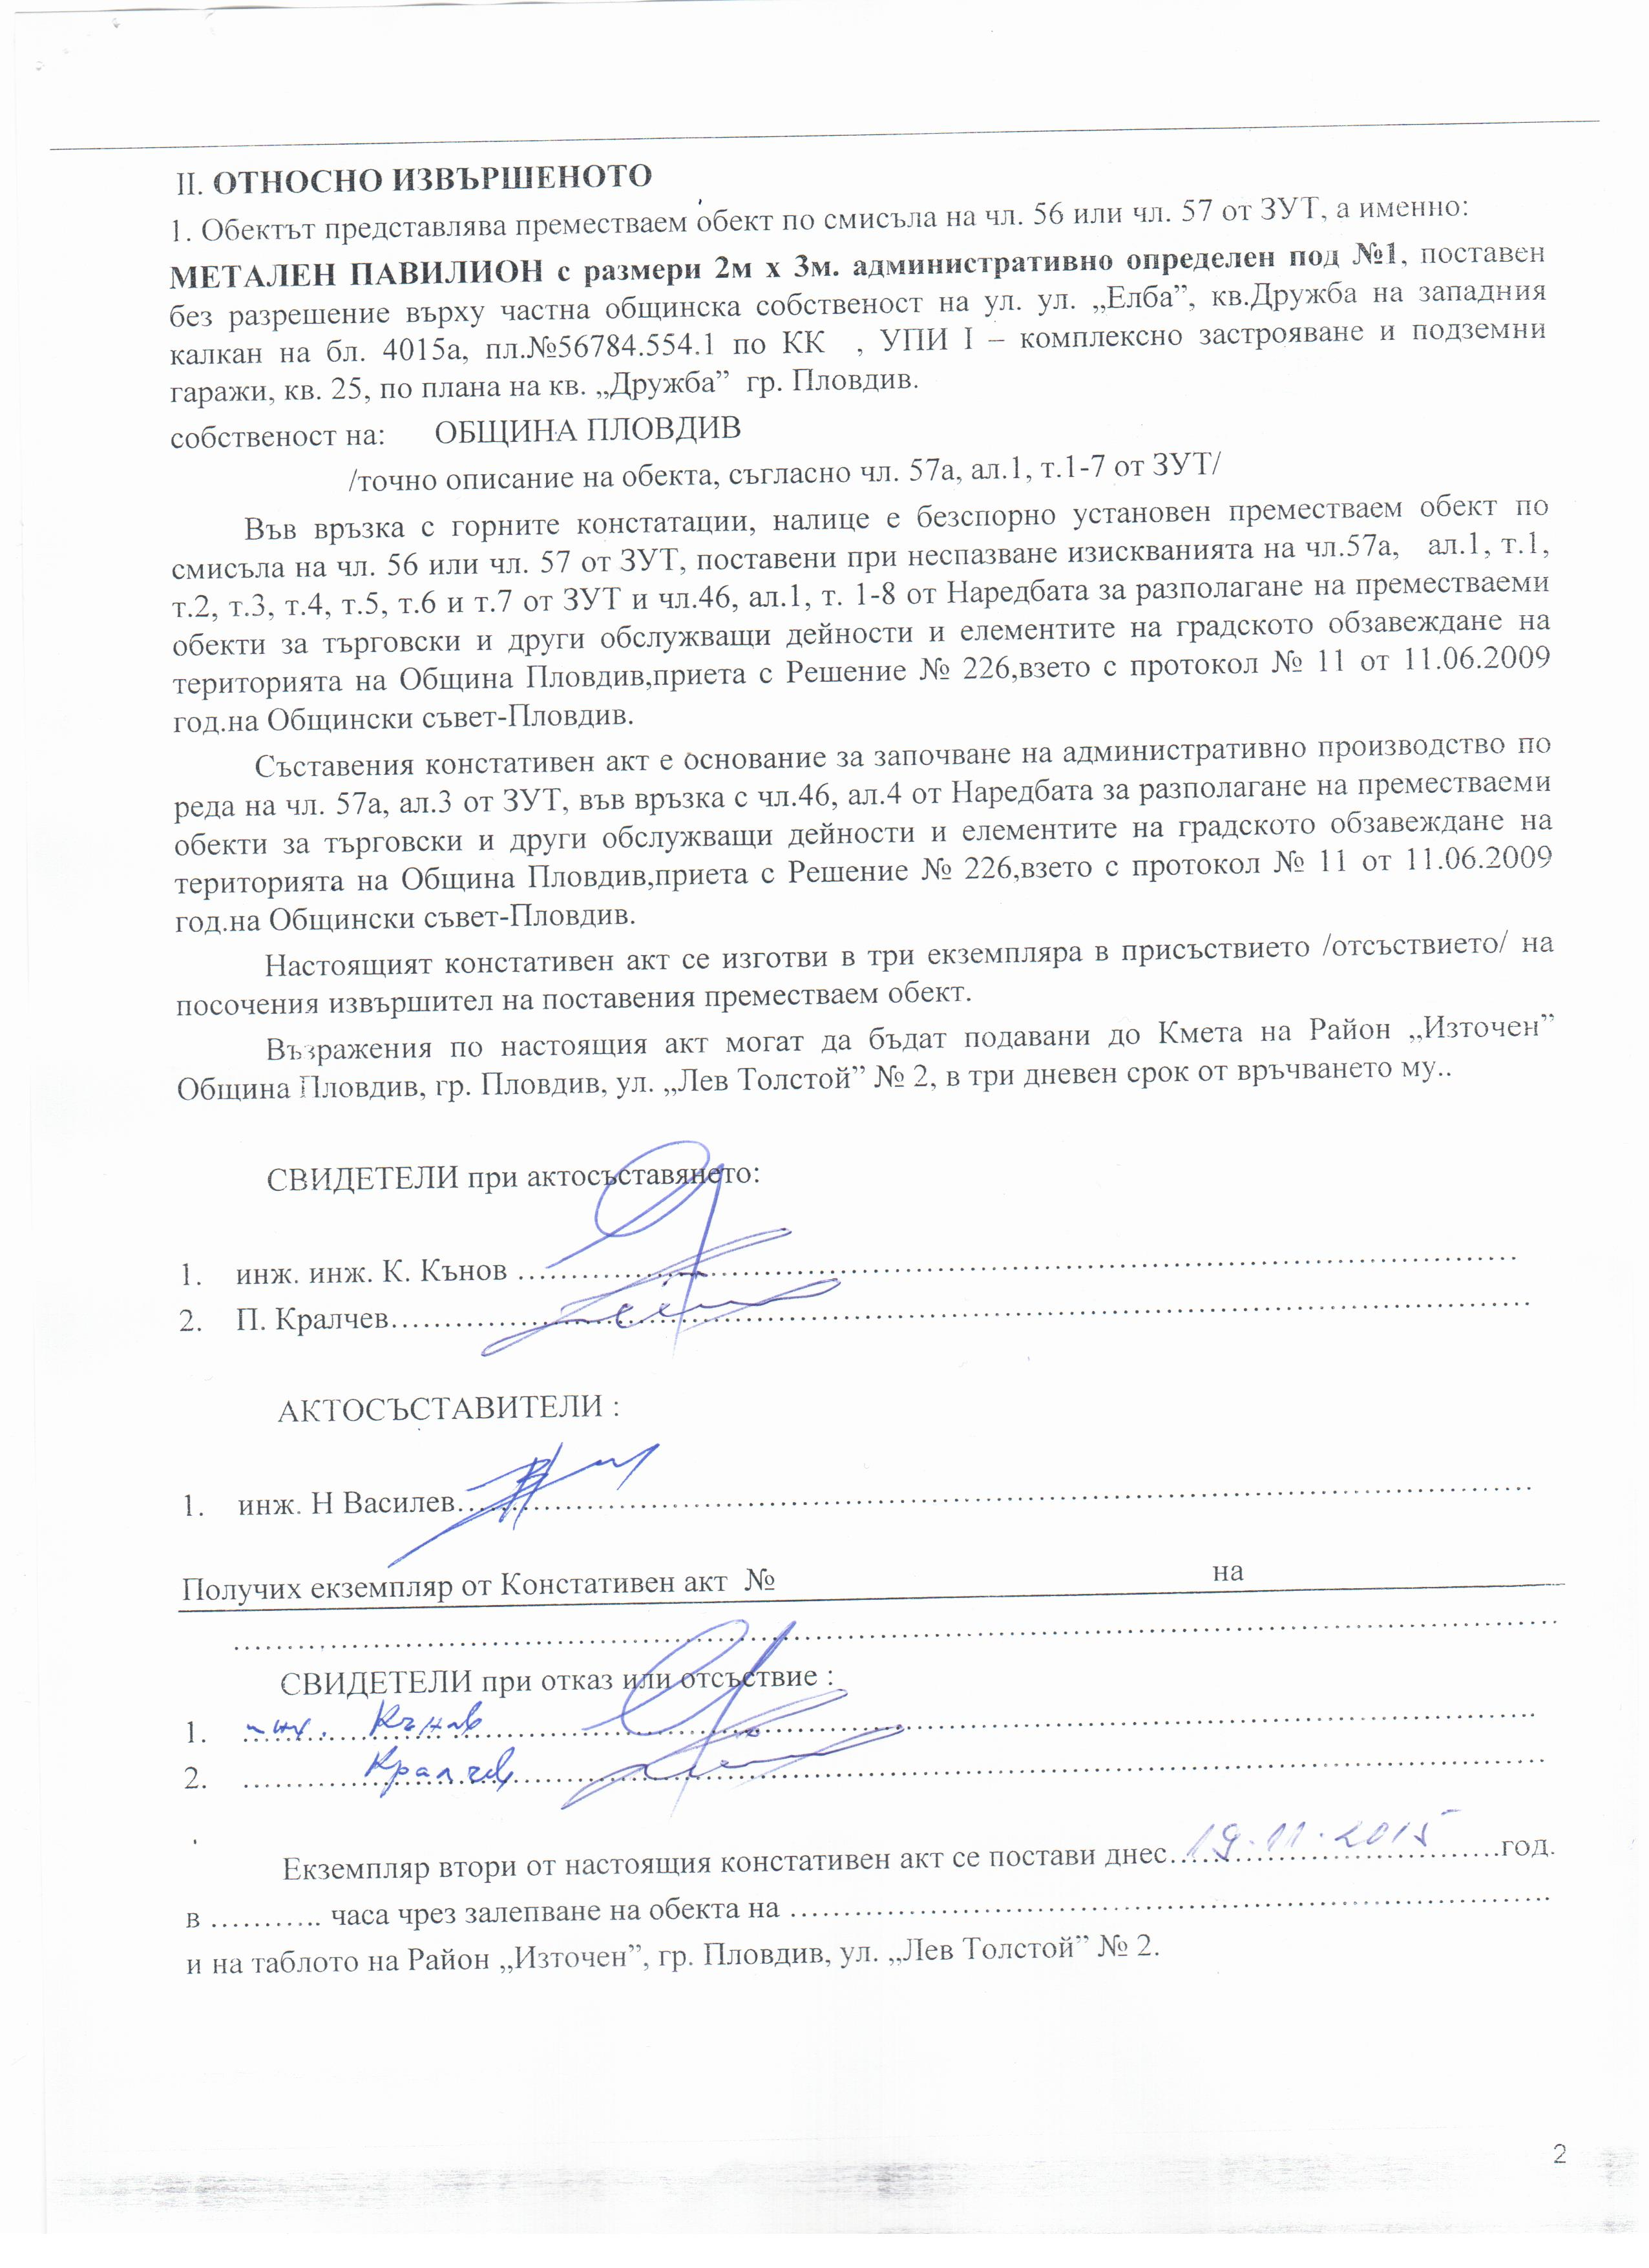 KONSTATIVEN_AKT_№77_1